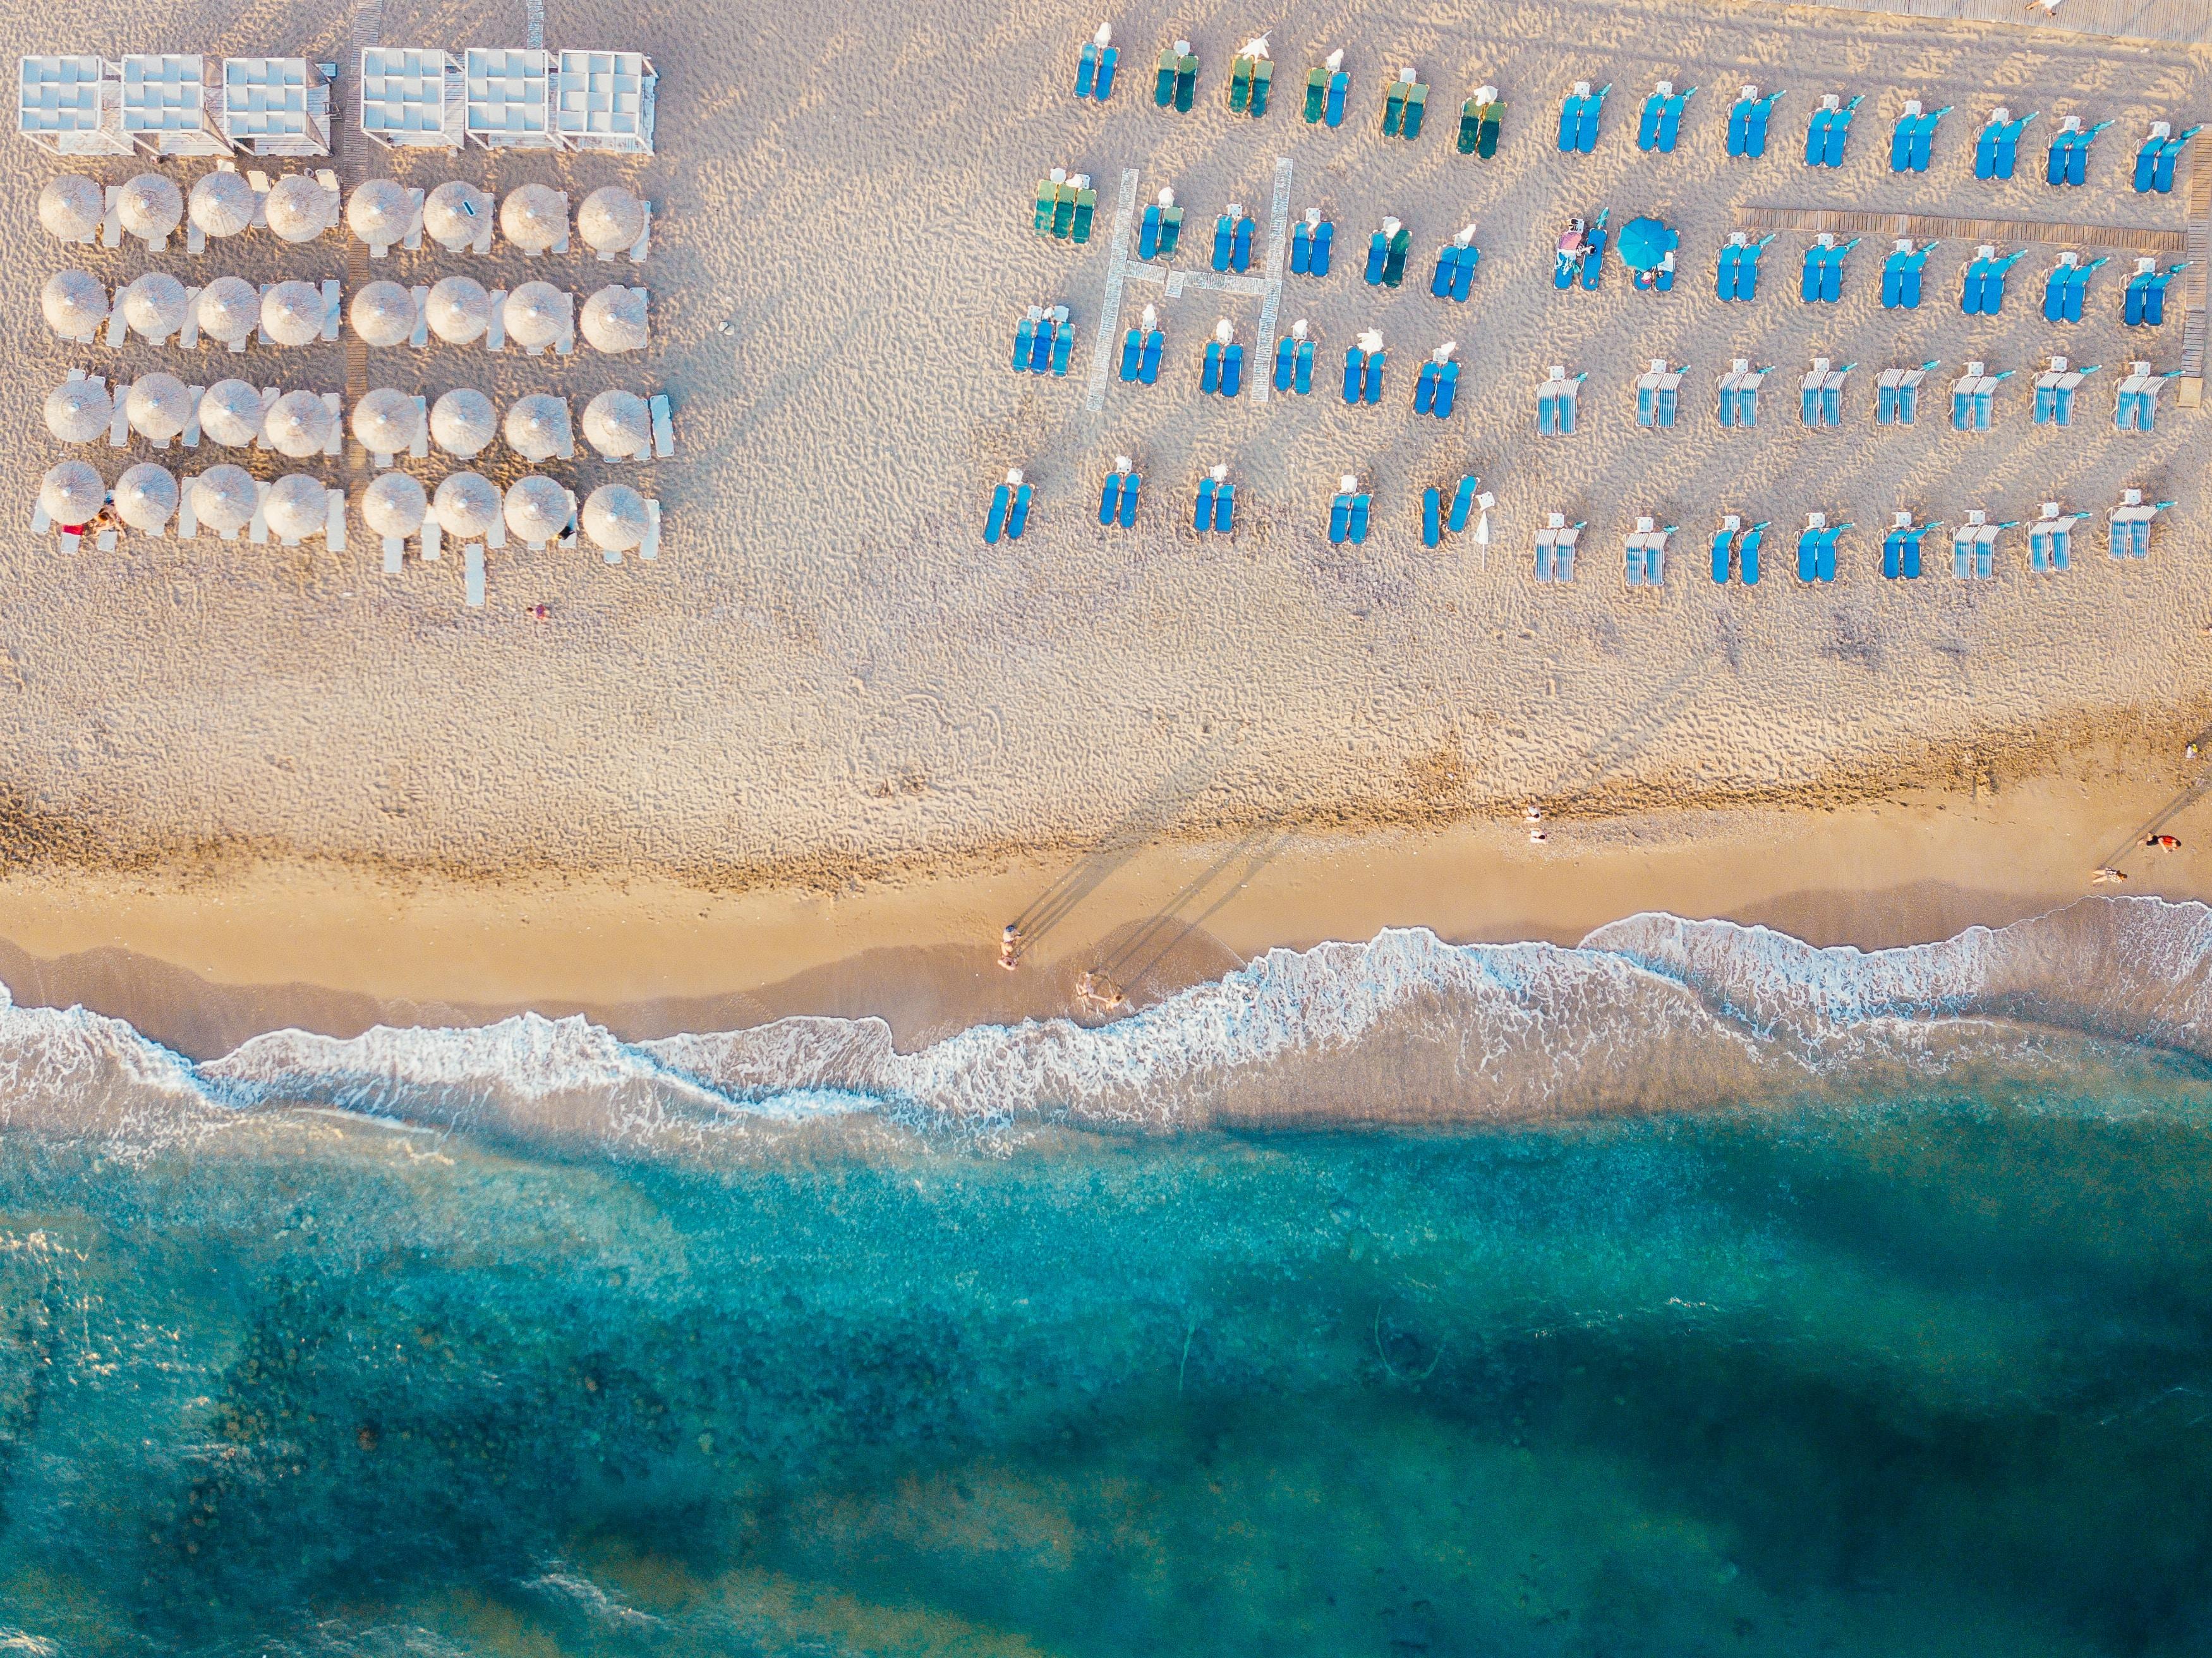 bird's-eye view of beach umbrella